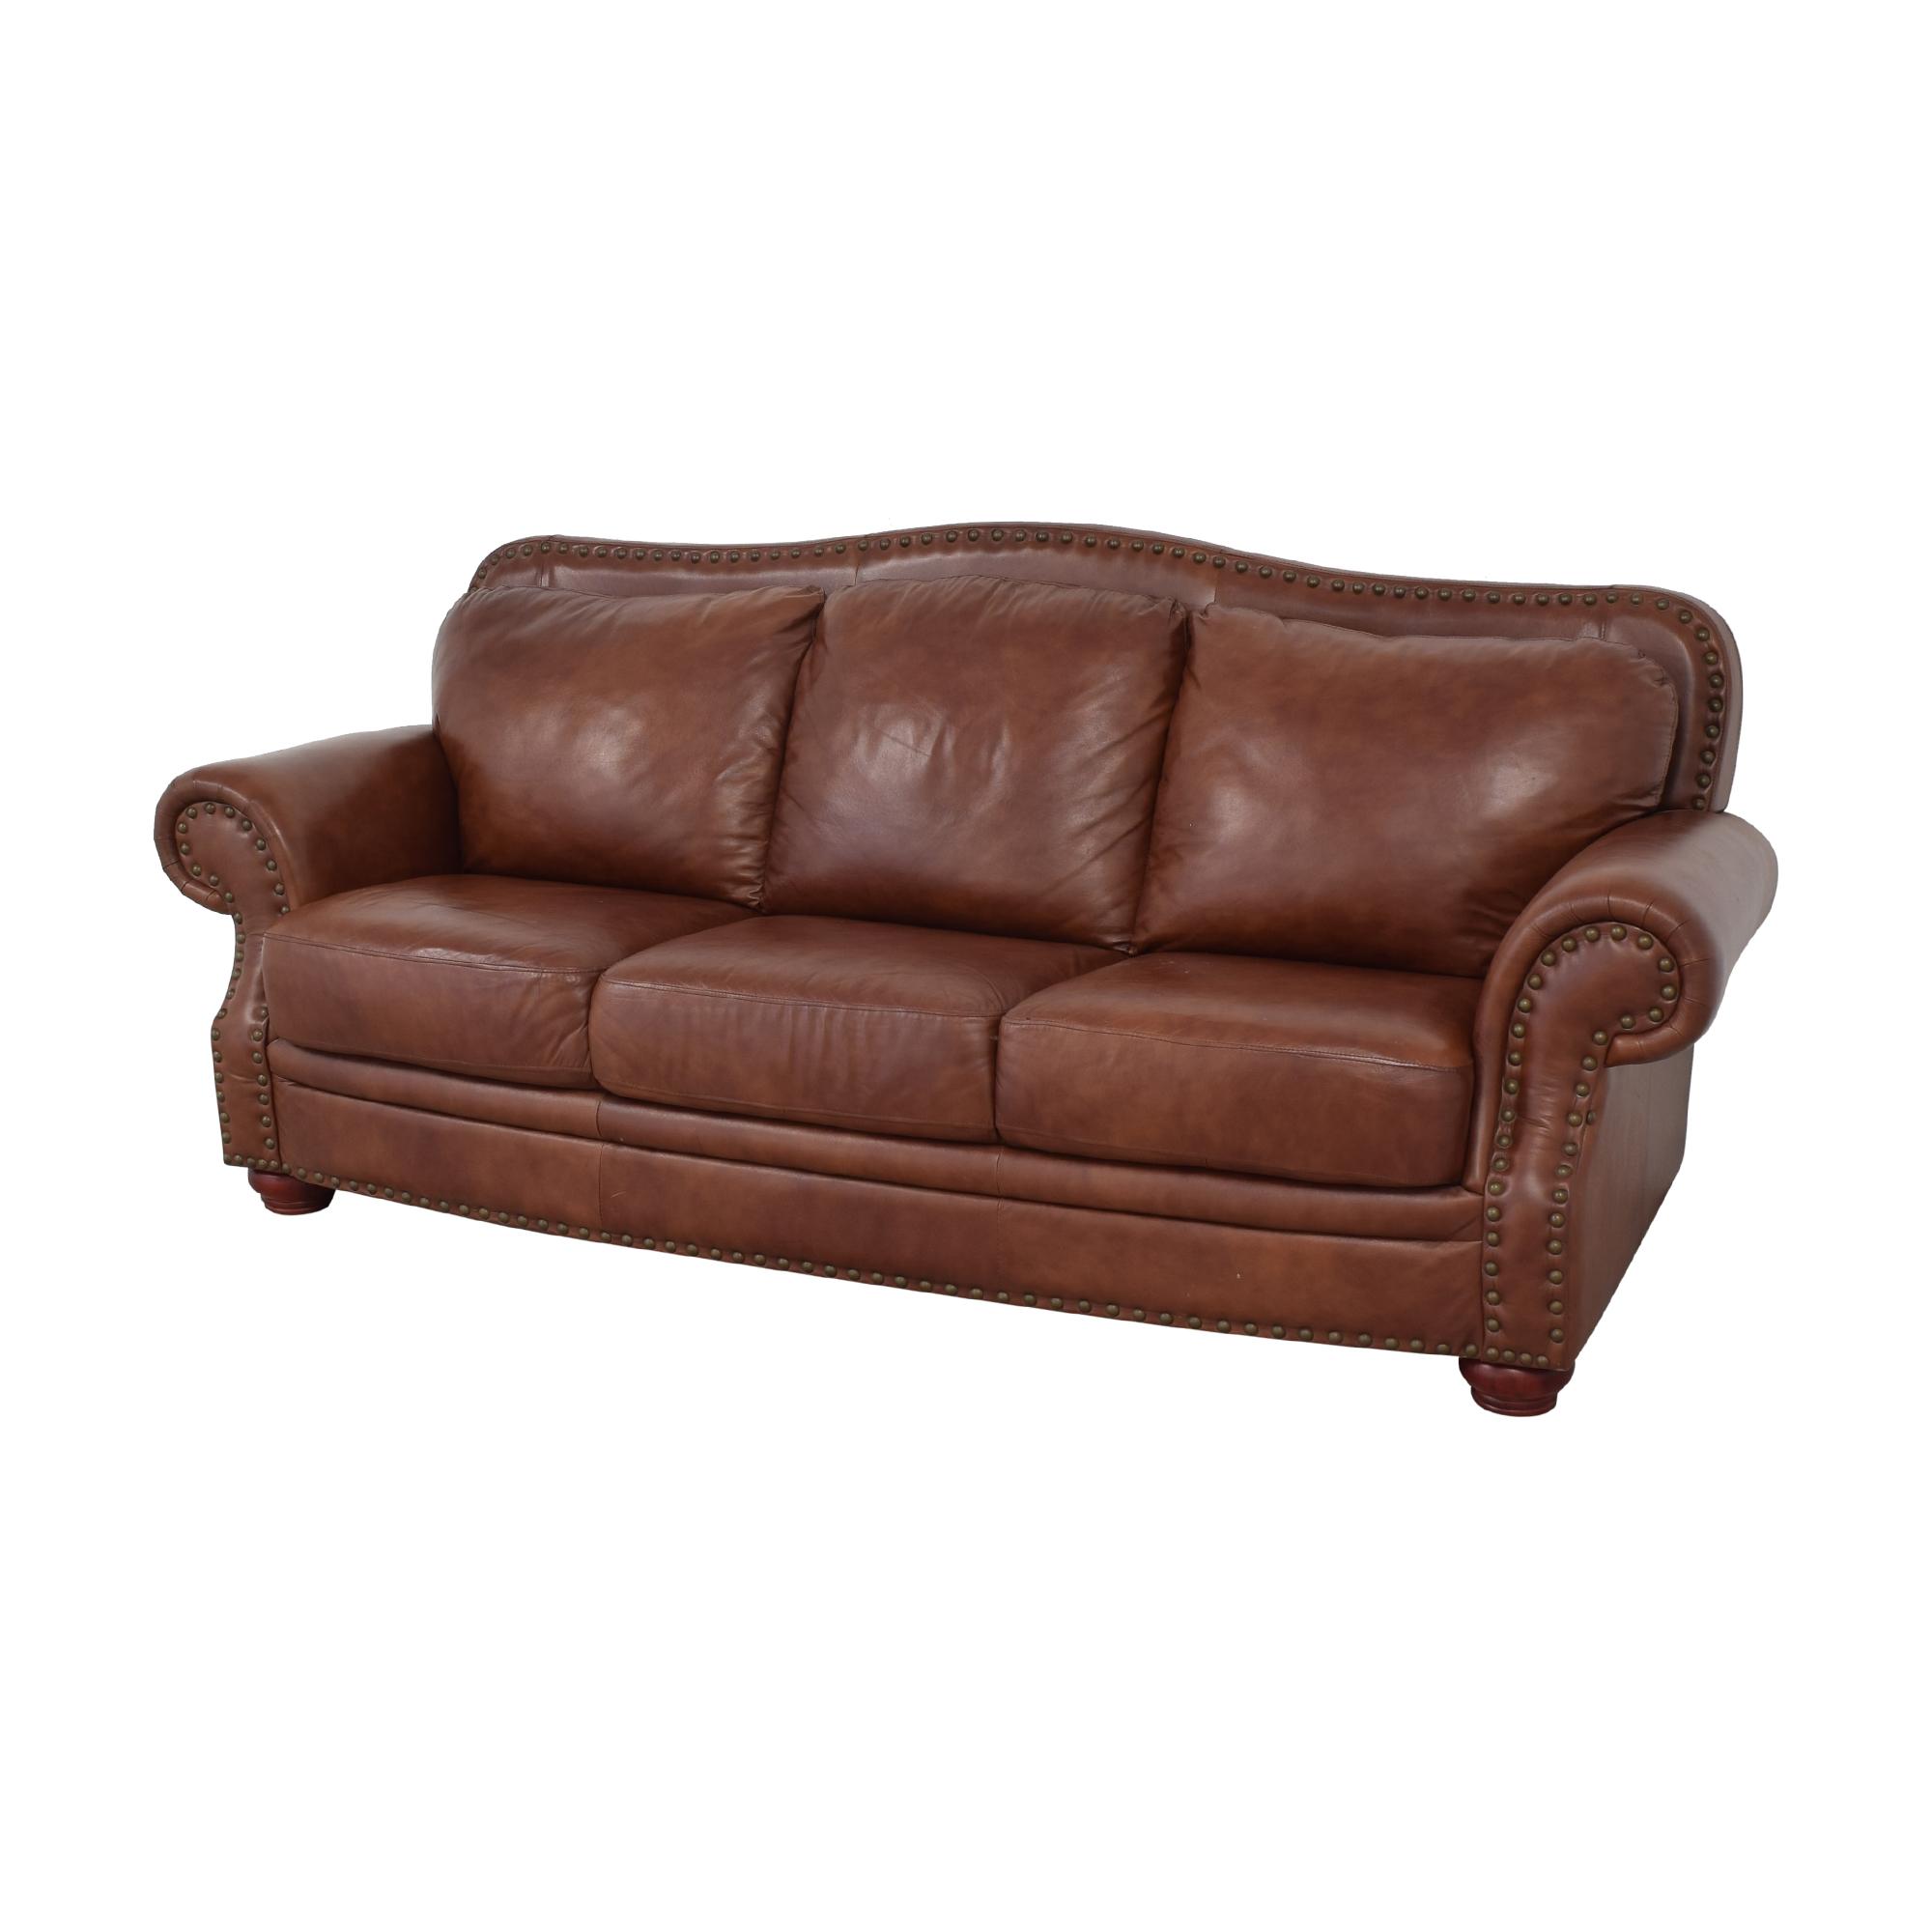 Rolled Arm Camel Back Sofa brown